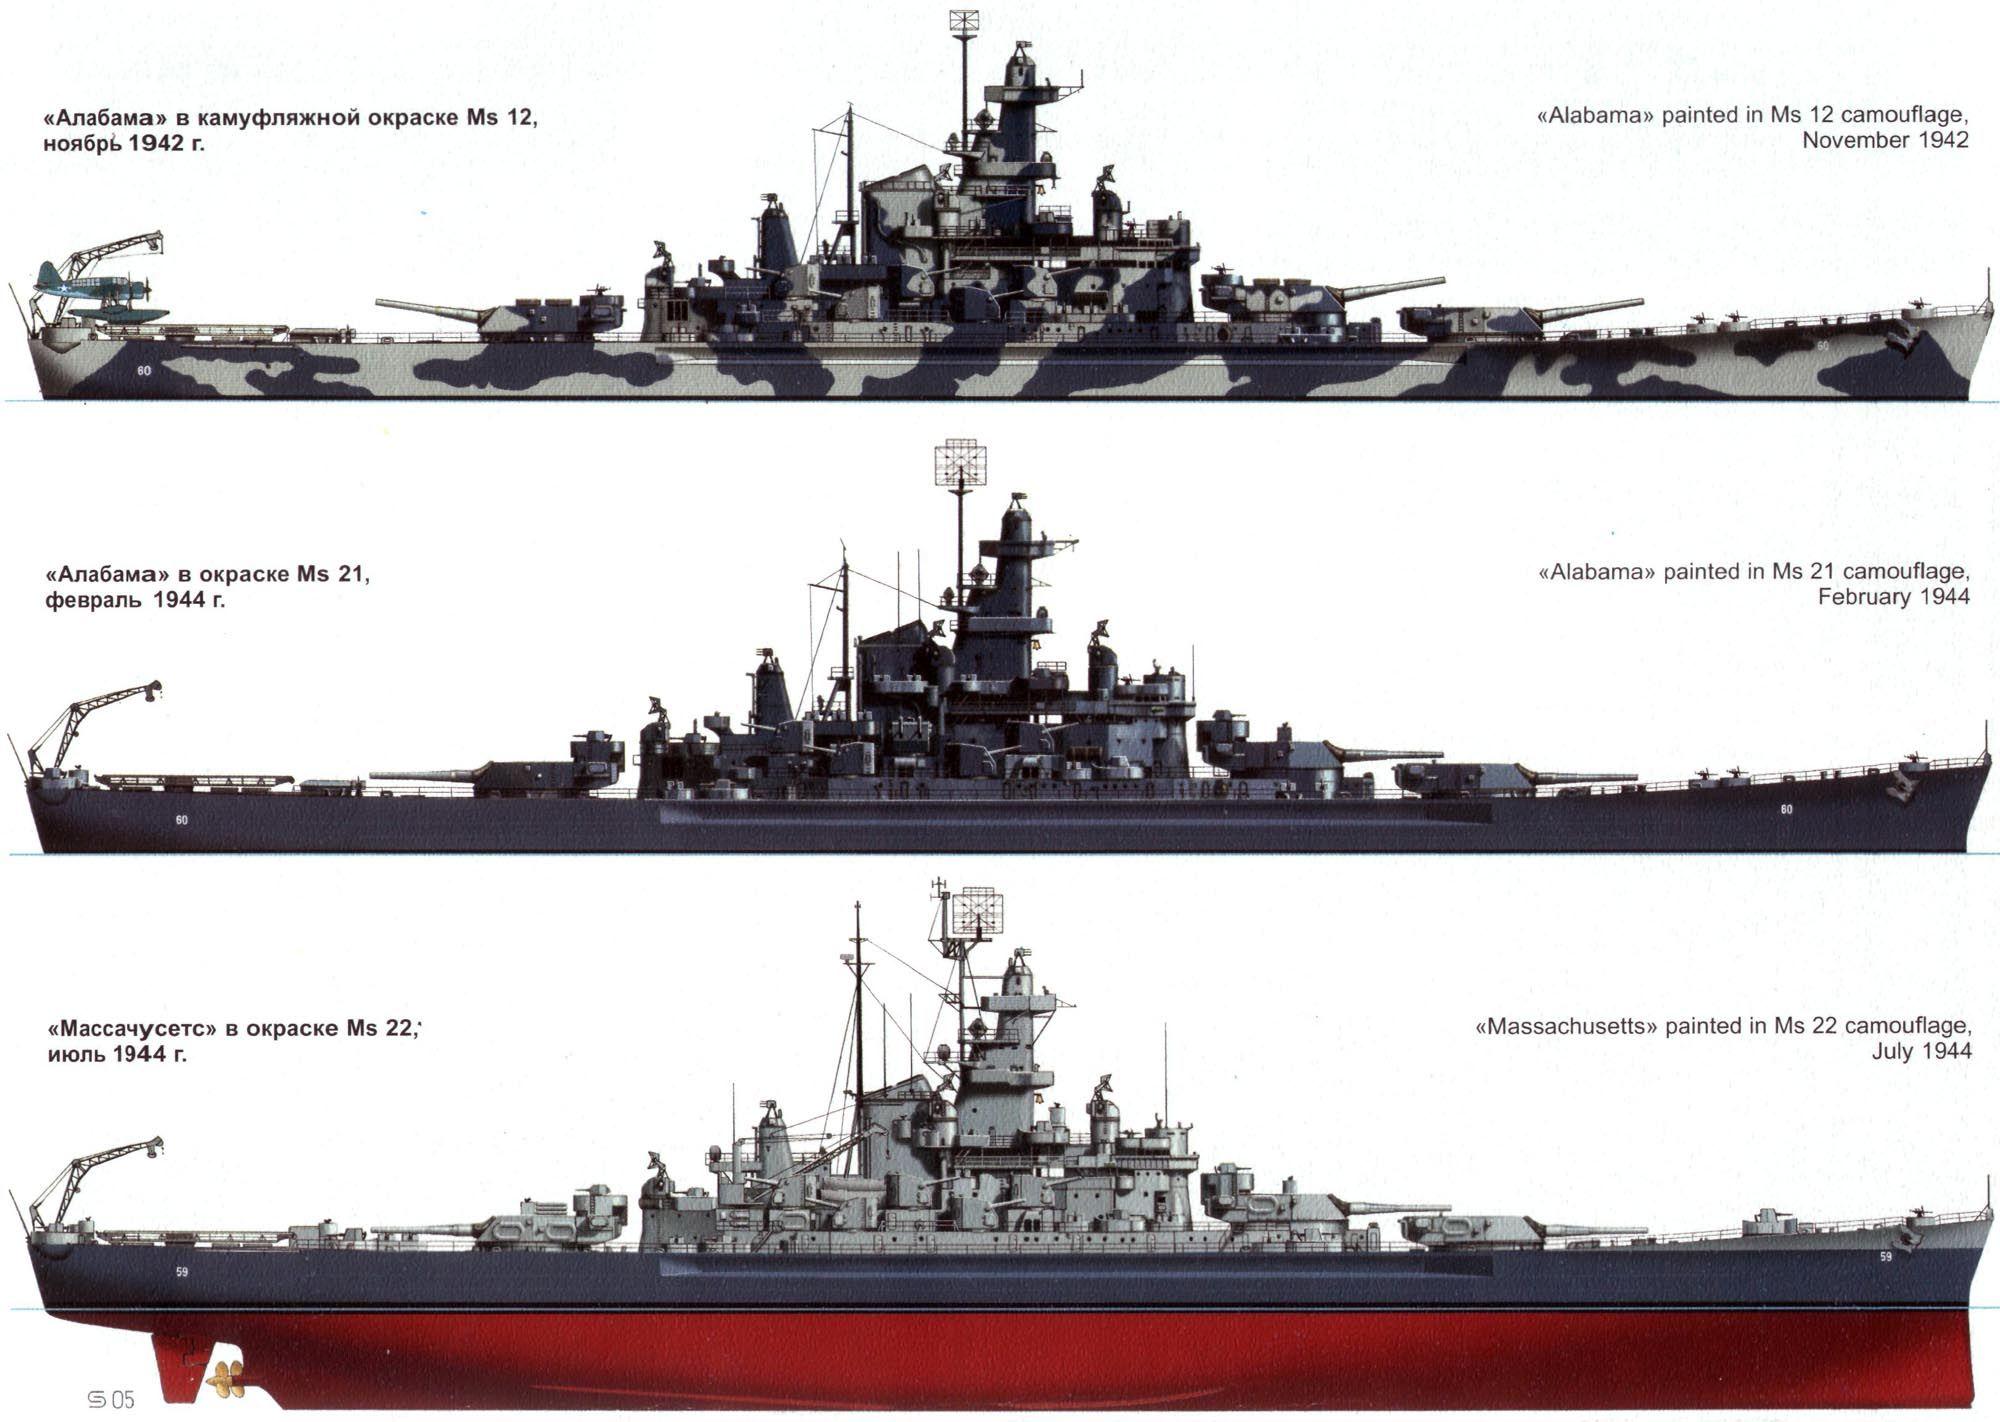 usn battleships: uss alabama (bb-60) & uss massachusetts (bb-59)